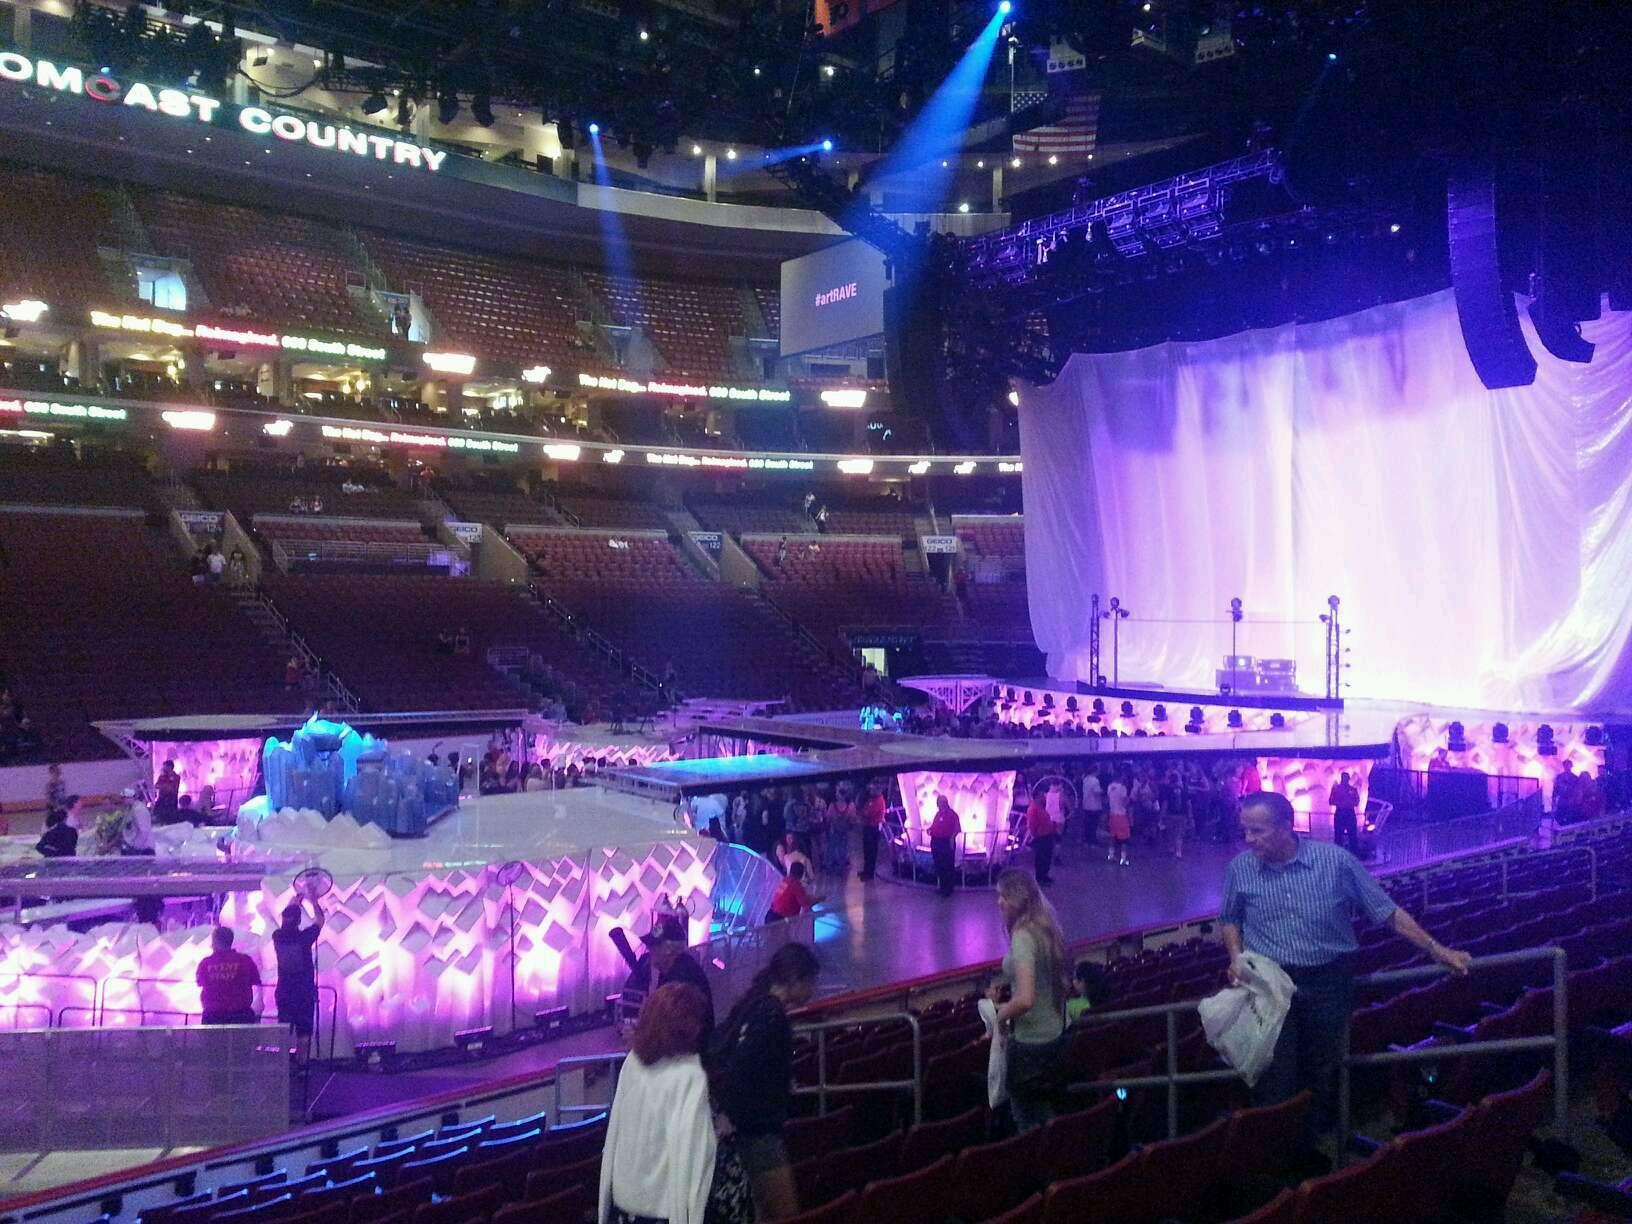 Wells Fargo Center Section 112 Concert Seating